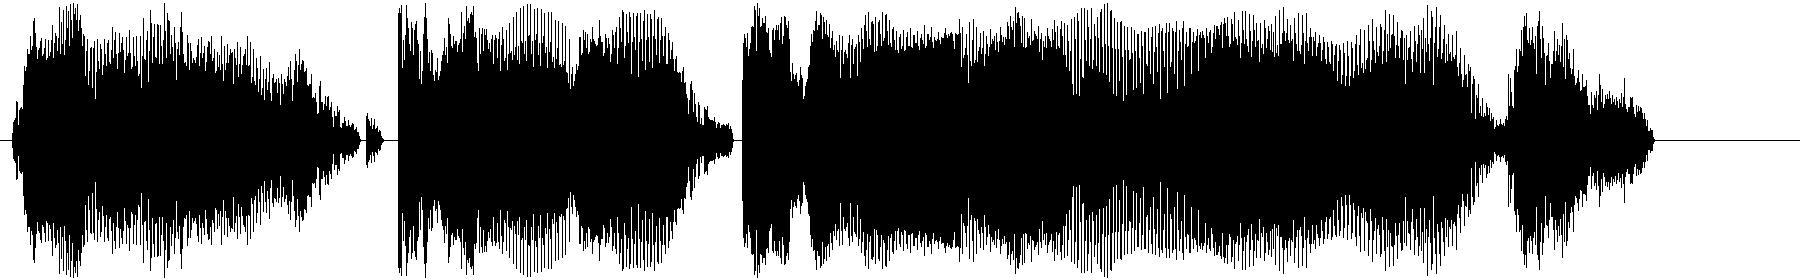 009 female